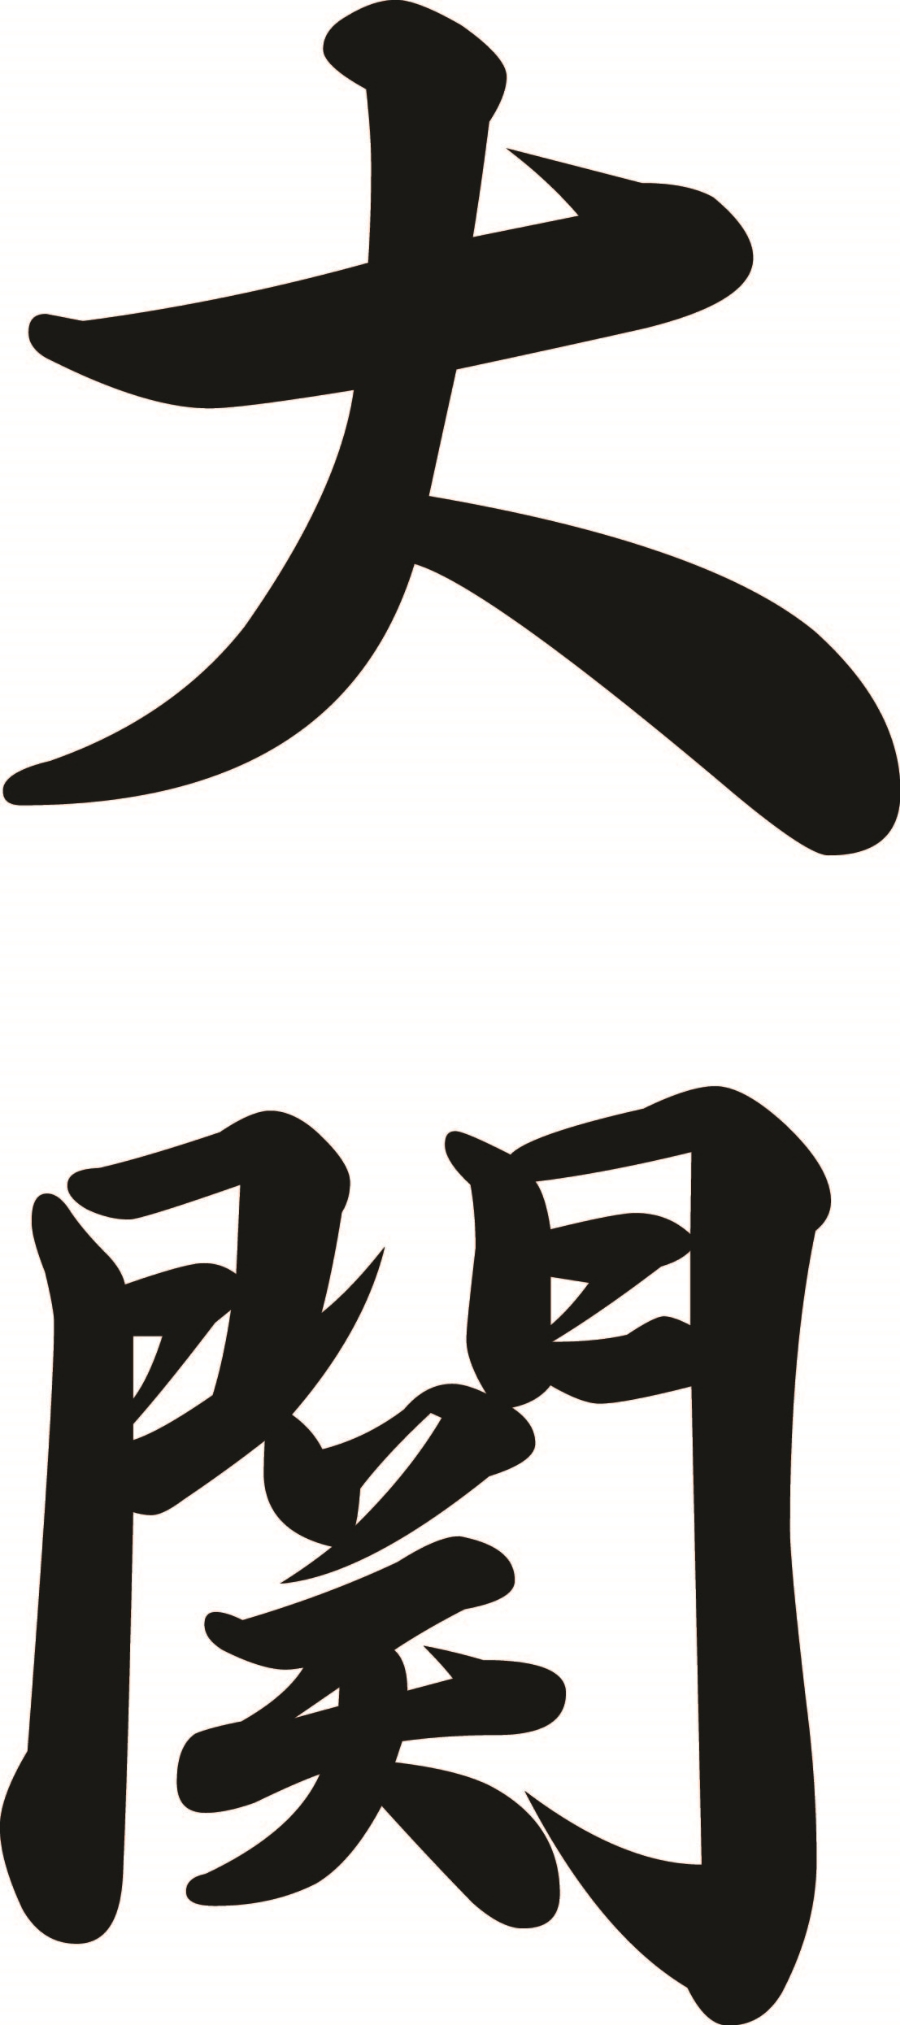 The Ozeki moniker in Kanji. Calligraphy by  Asian Brush Arts & Graphic Design LLC .